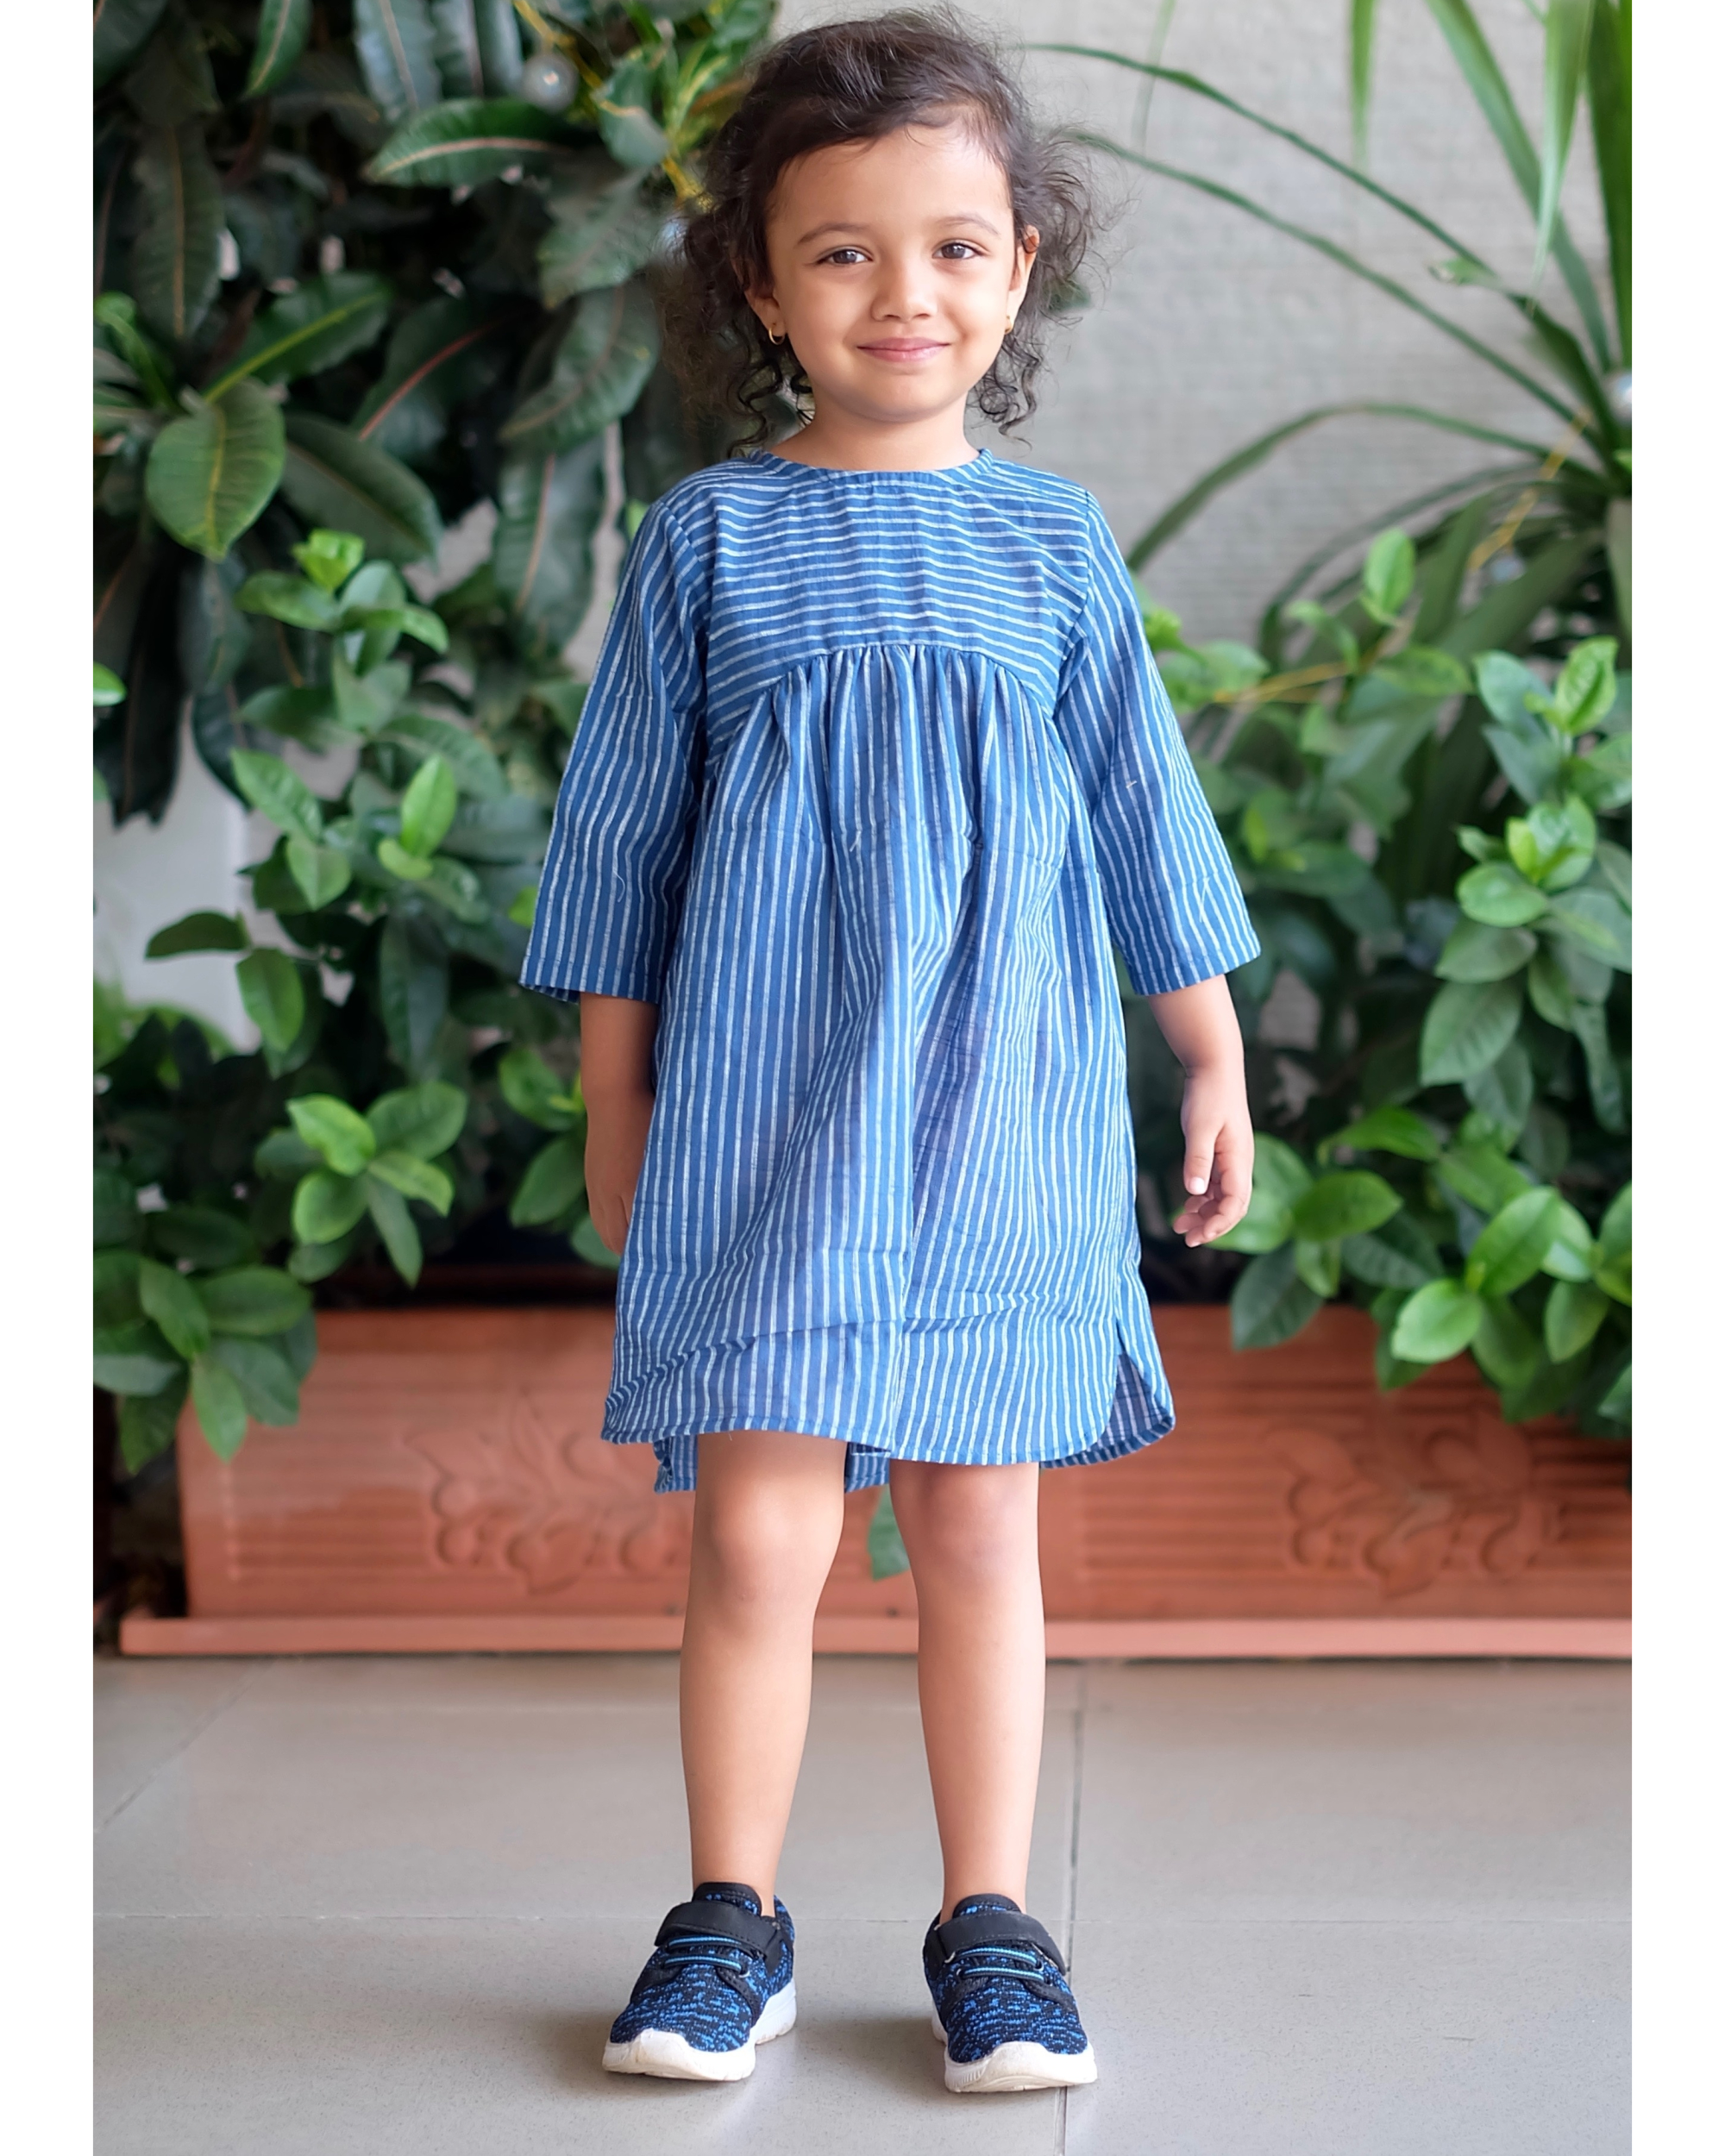 Blue and white striped yoke dress